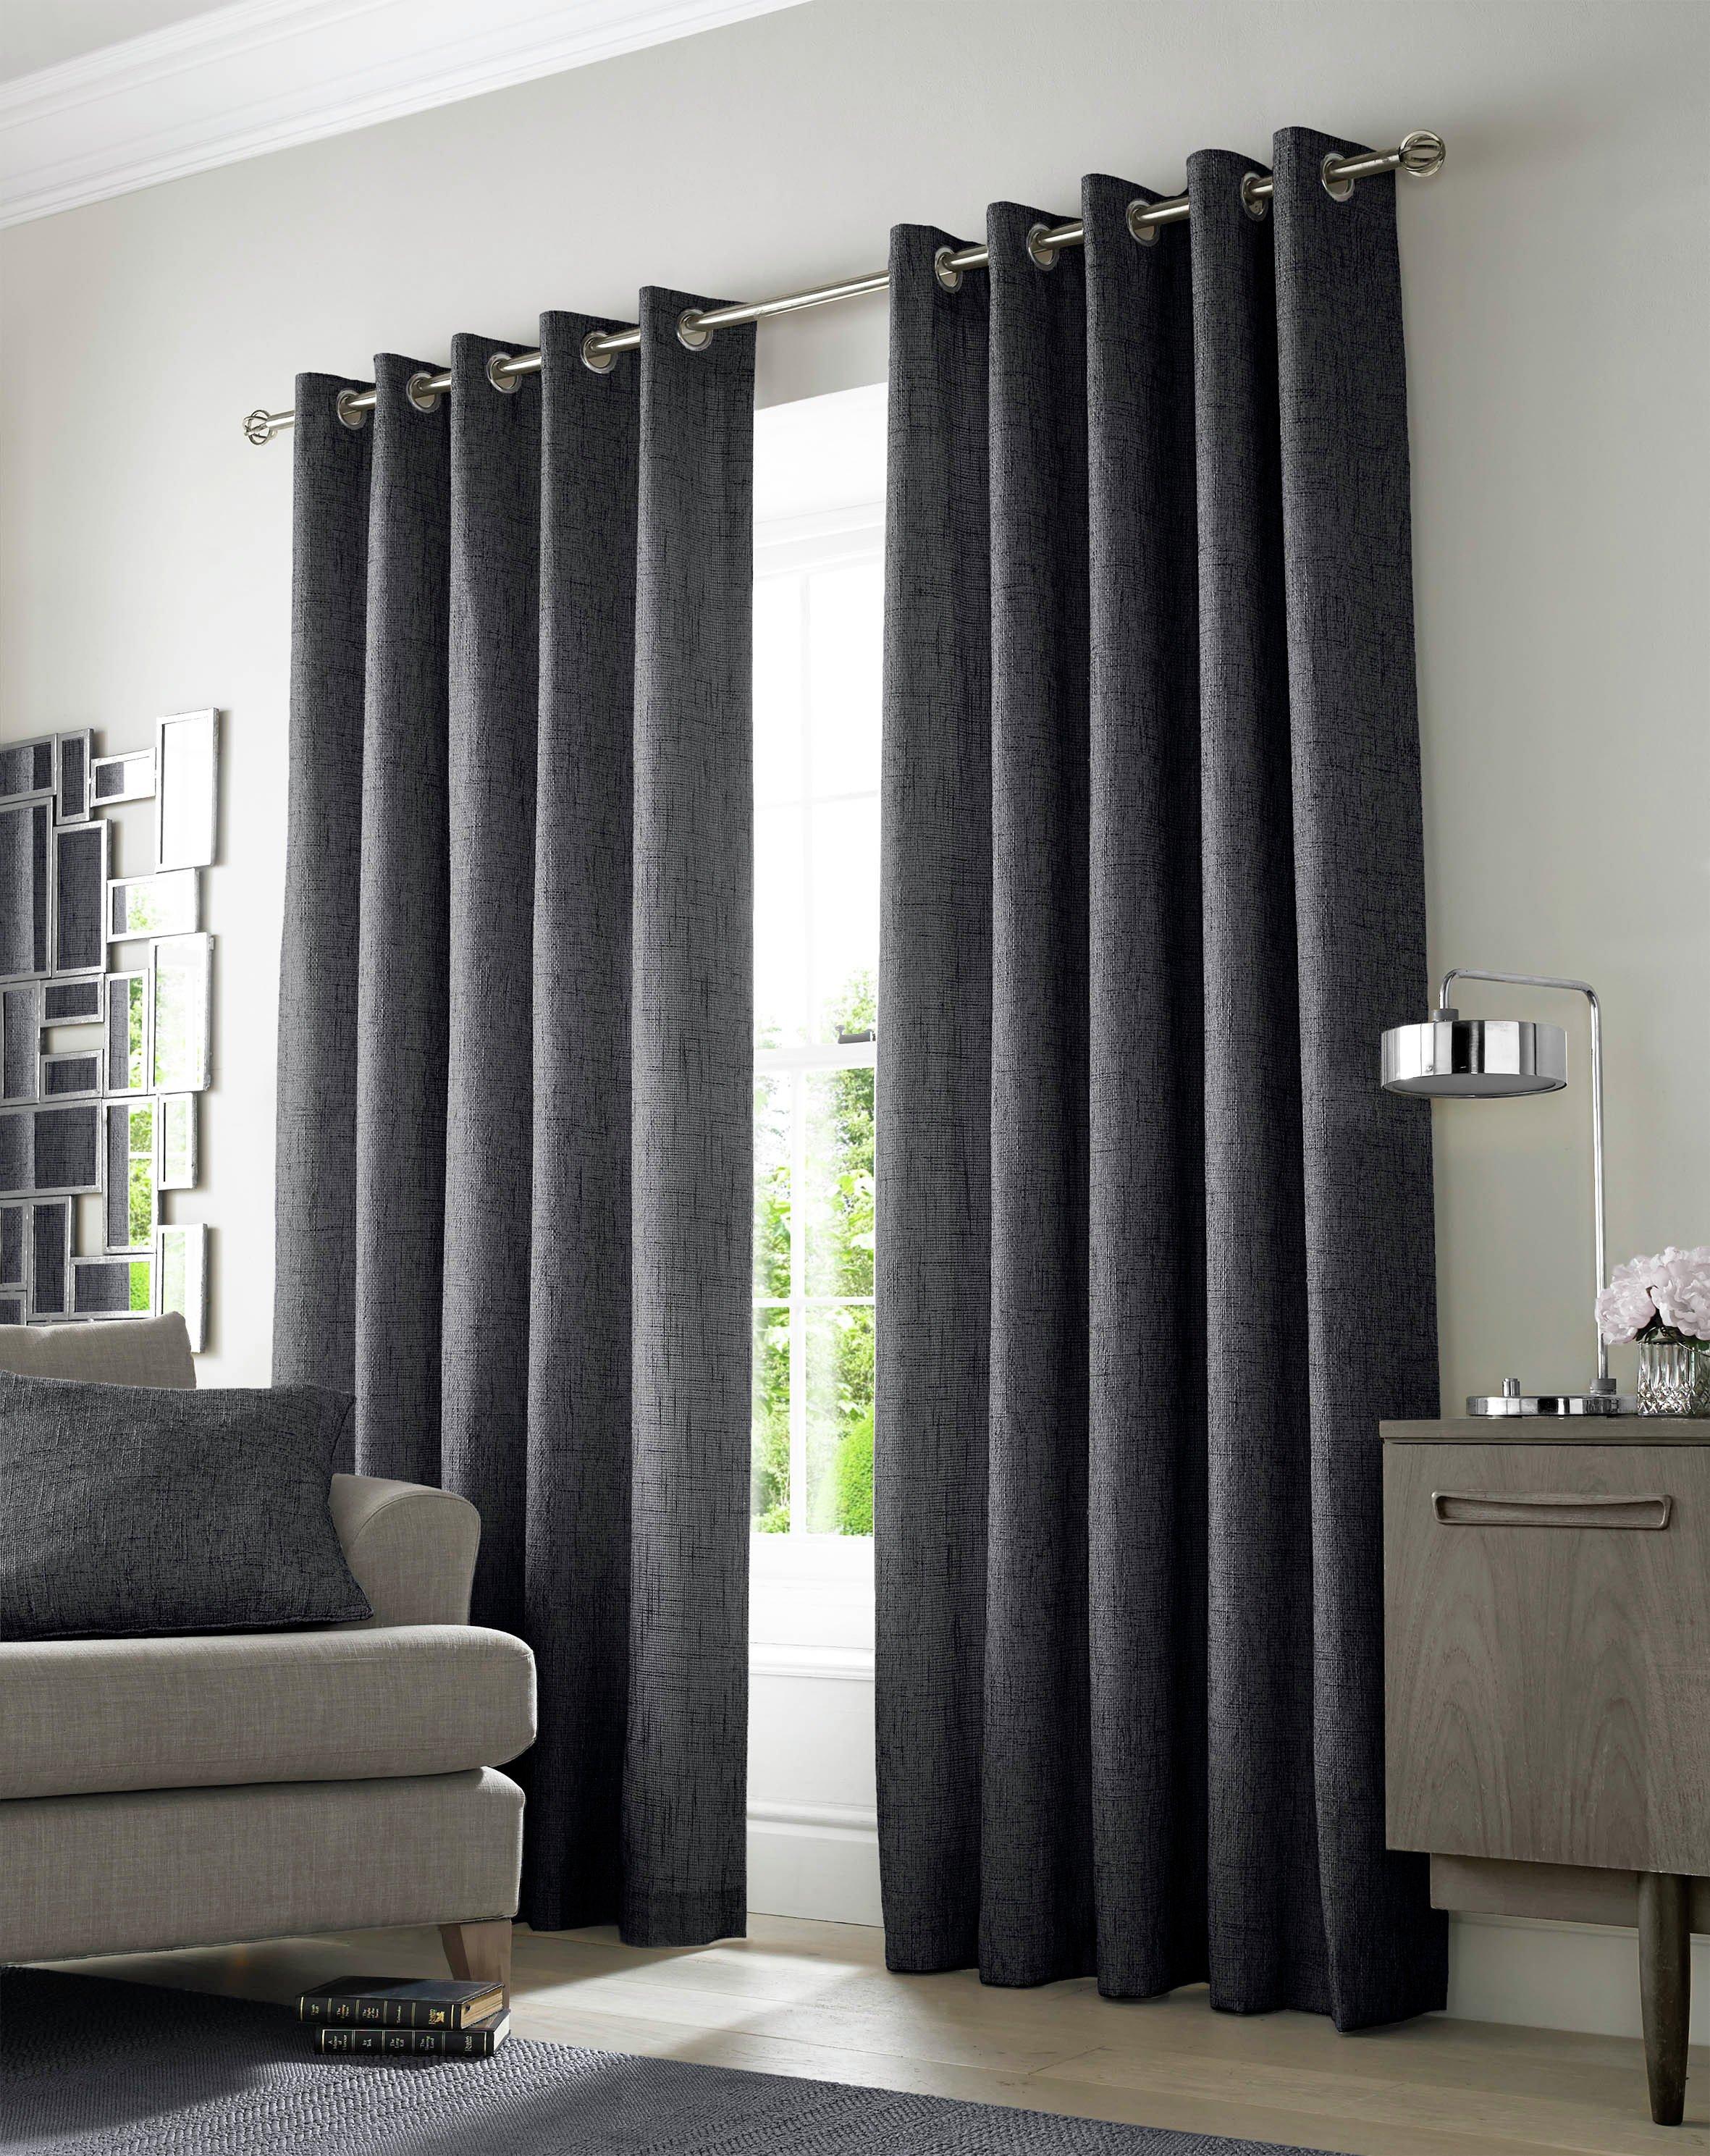 Academy Eyelet Curtains - 229x183cm - Charcoal.